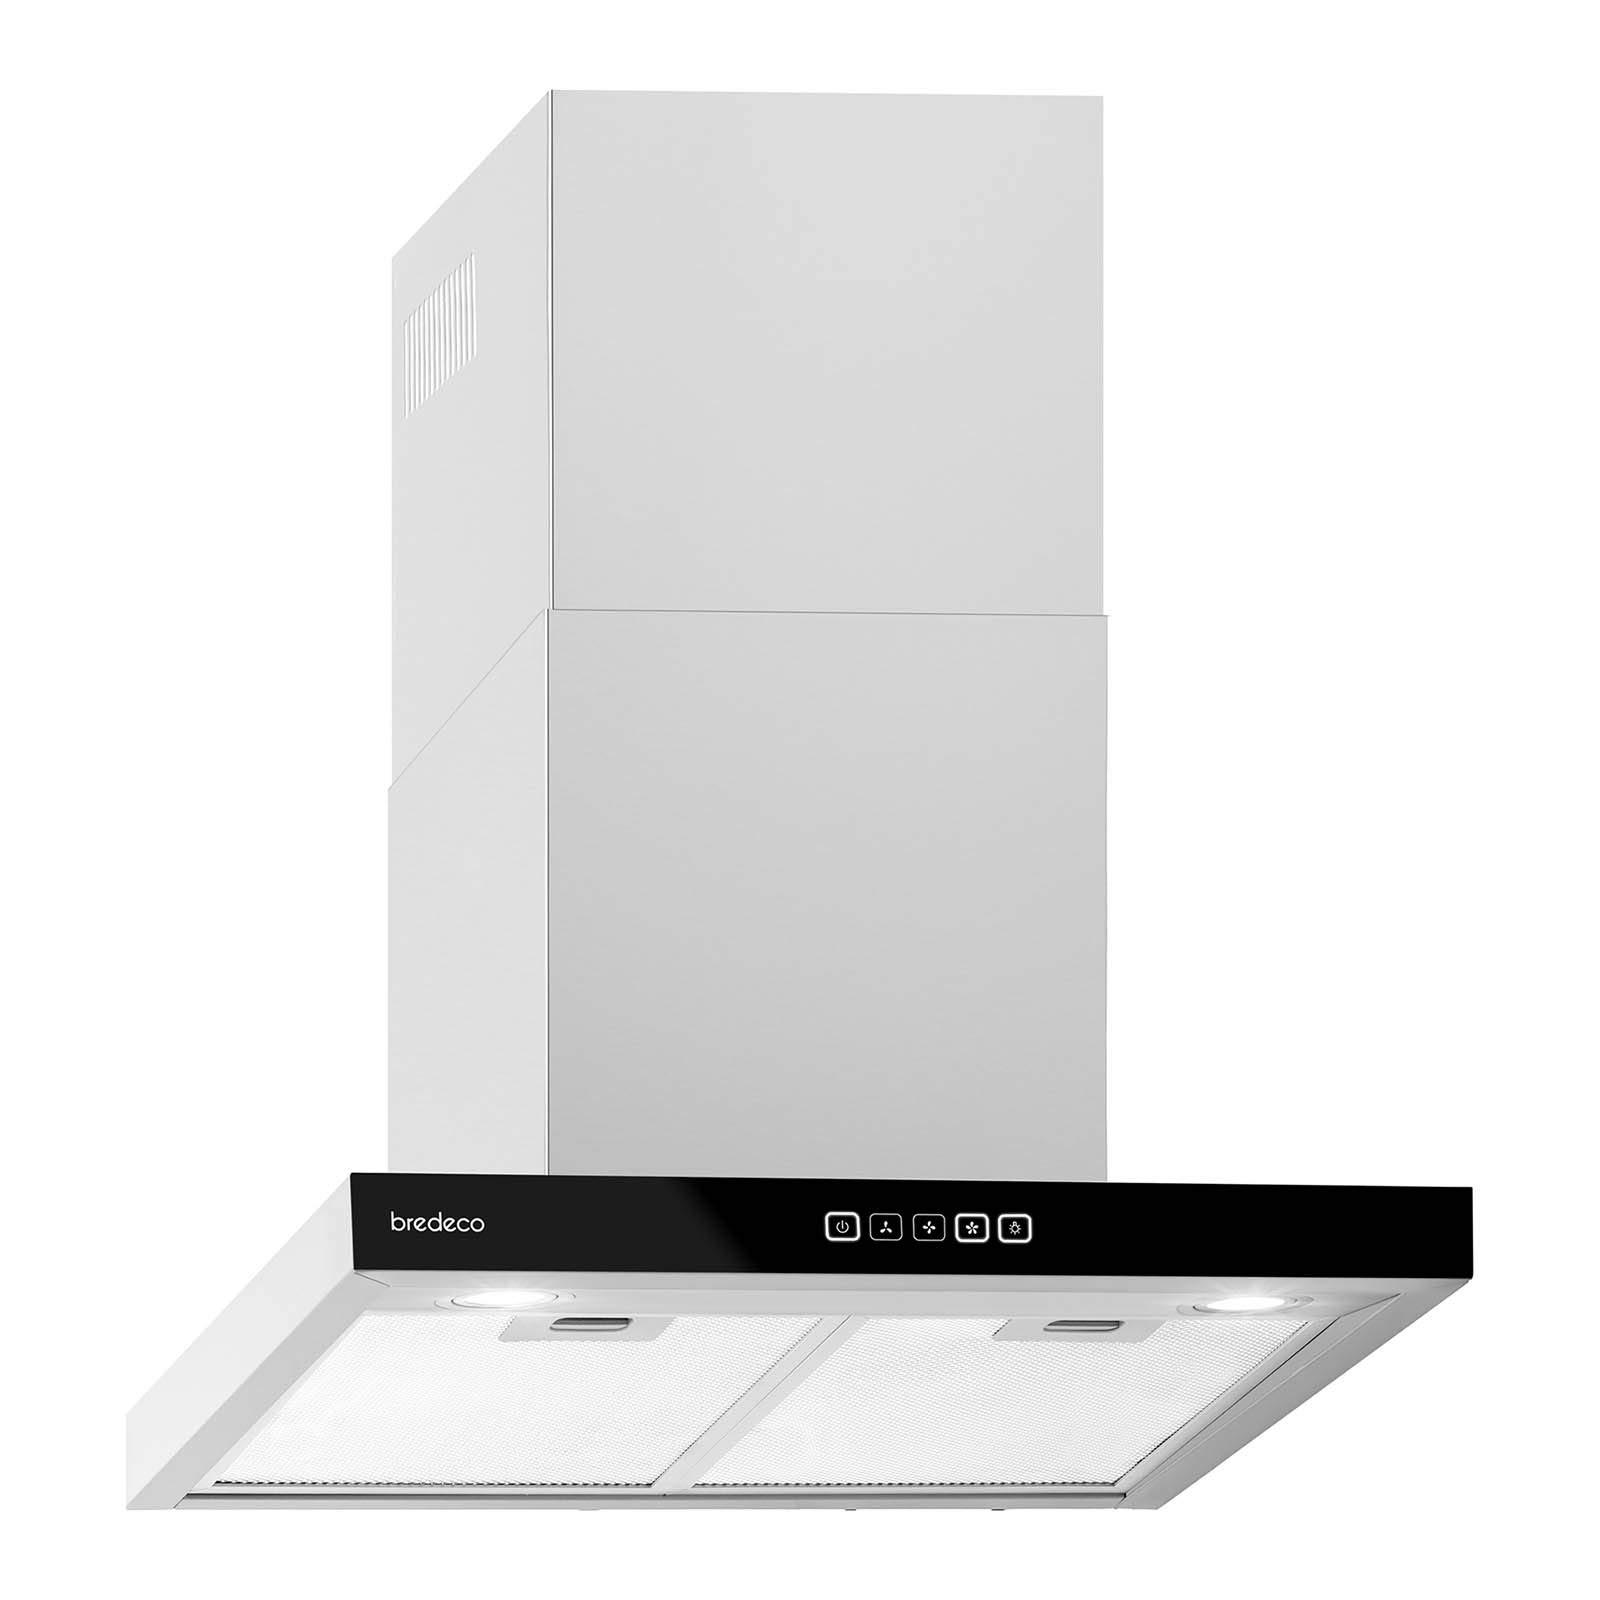 bredeco Campana De Pared Para Cocina BCCH-200A-60B (Longitud de 60 cm, 636,5 m³/h, Nivel de ruido de 70 dB, Pantalla táctil): Amazon.es: Grandes electrodomésticos